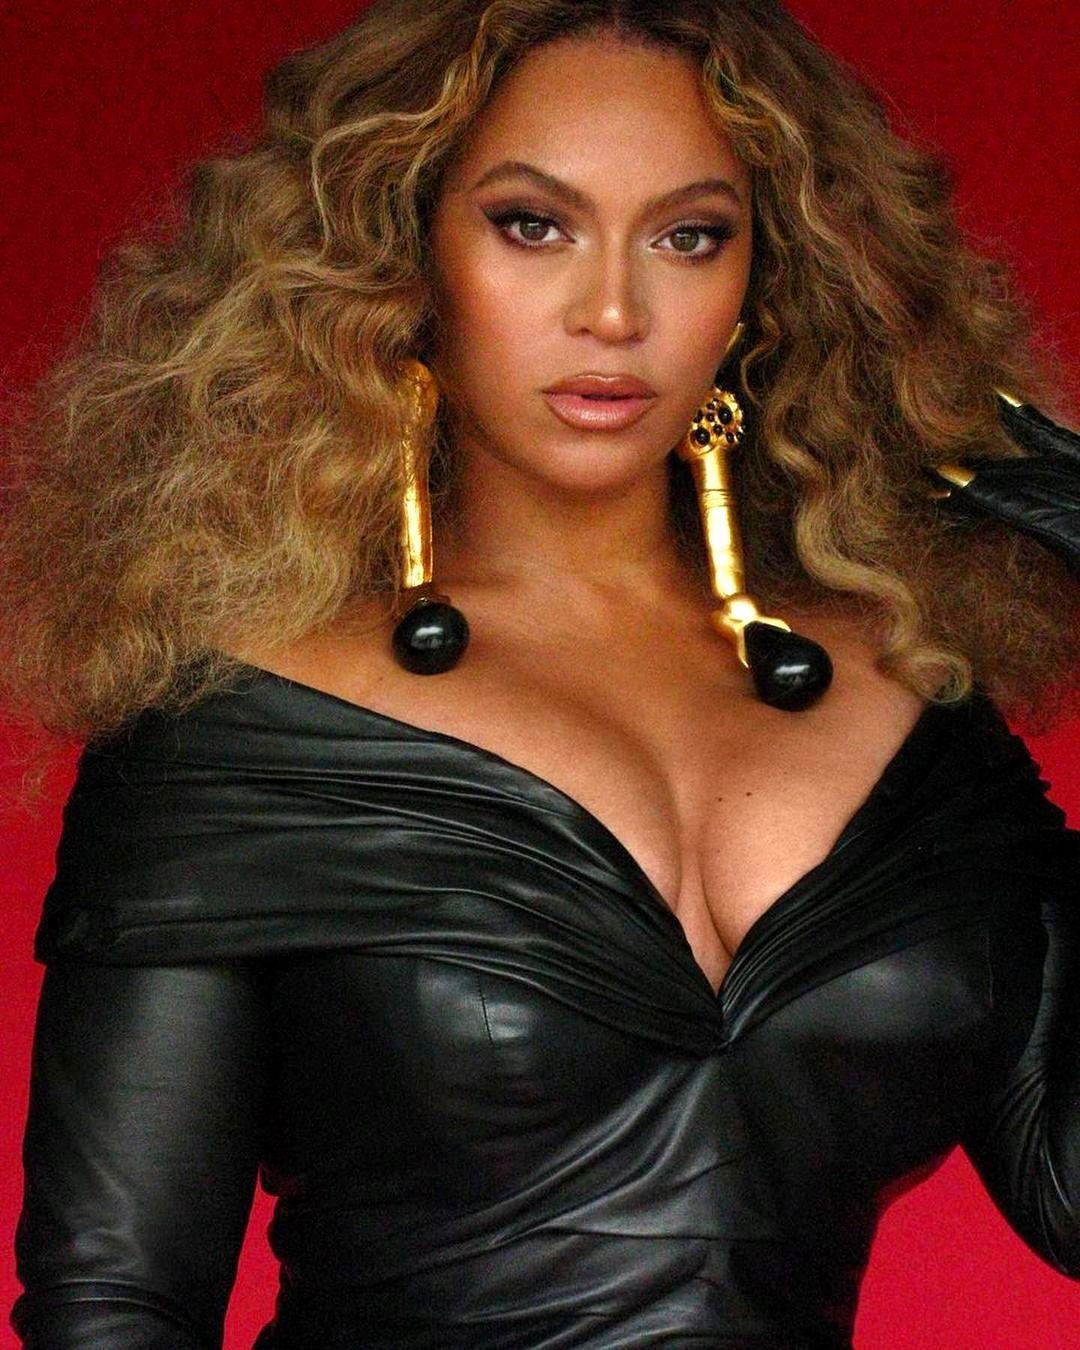 SPOTTED: Beyonce wears Schiaparelli to accept Record-Breaking Grammy – PAUSE Online   Men's Fashion, Street Style, Fashion News & Streetwear